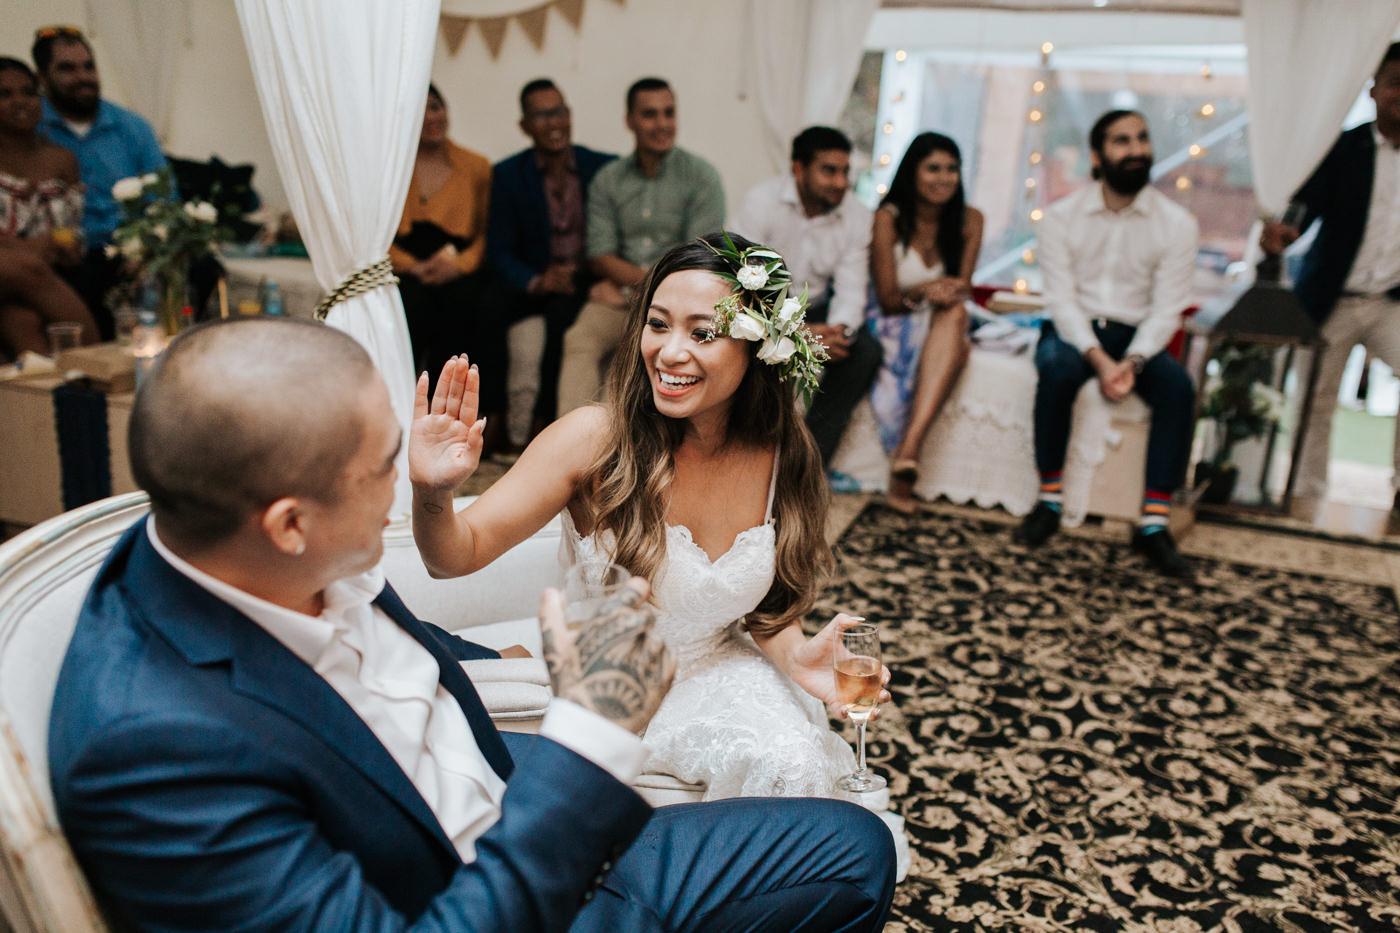 Nick & Vanezza - Fernbank Farm Wedding - Samantha Heather Photography-150.jpg